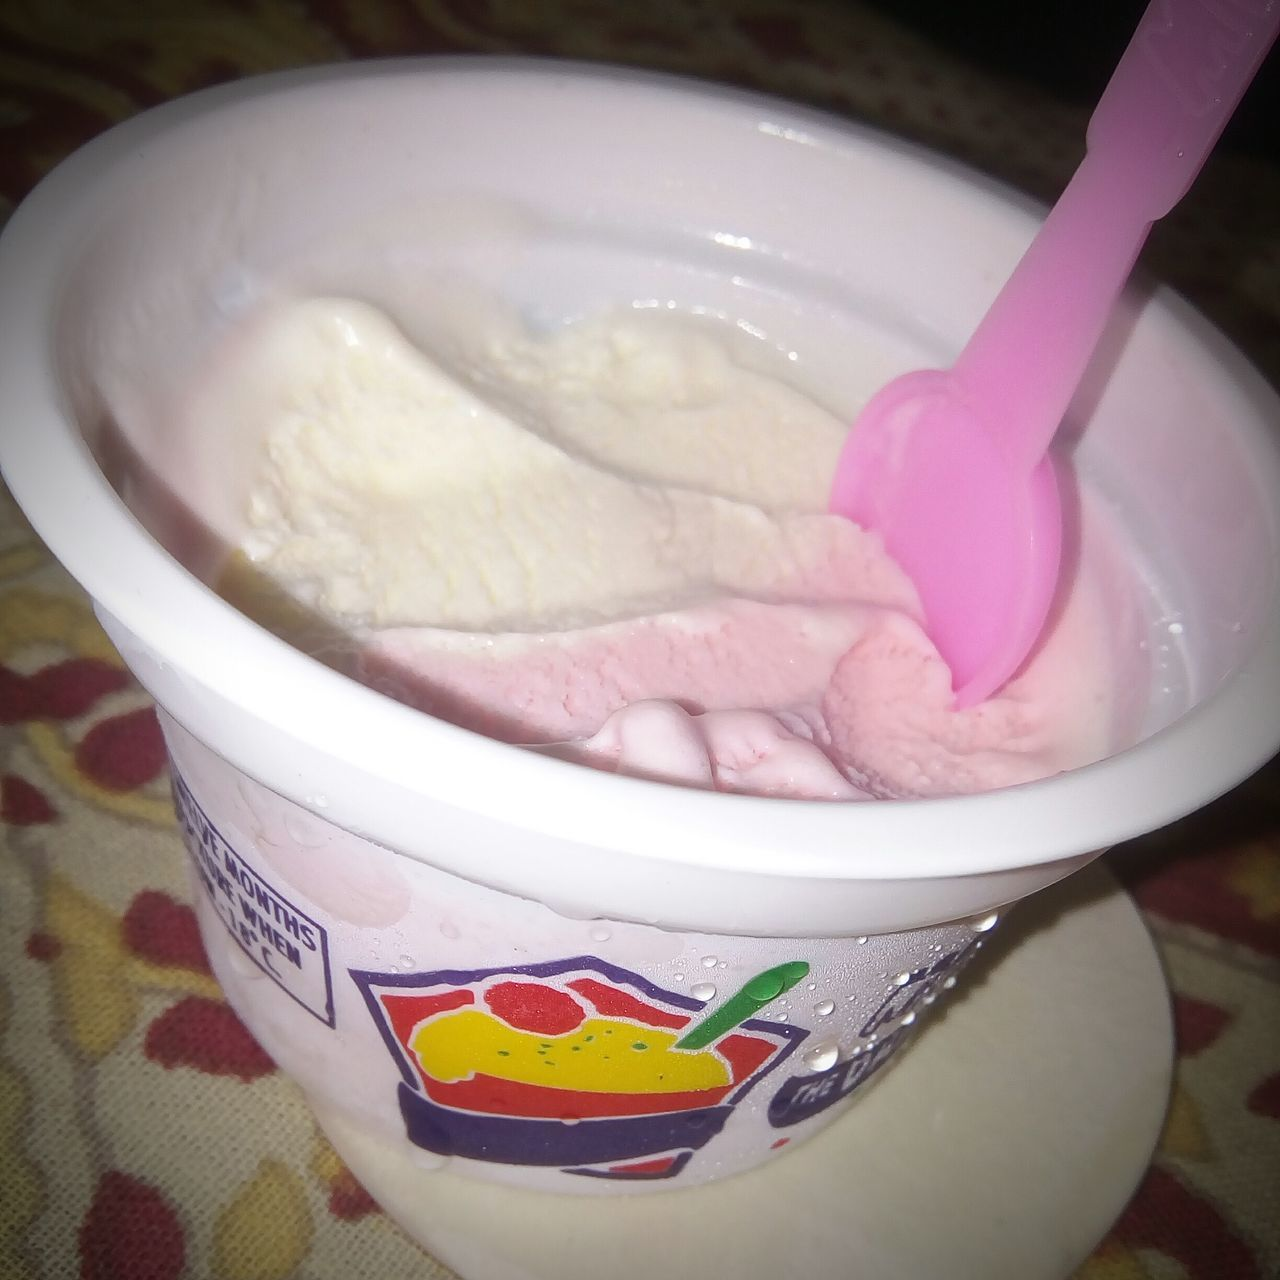 Ice Cream Icecream🍦 Icecream Ice Cream ❤ Icecream! Icecream Lovers Icecream♡ Icecreamlove Icecreamloverforever